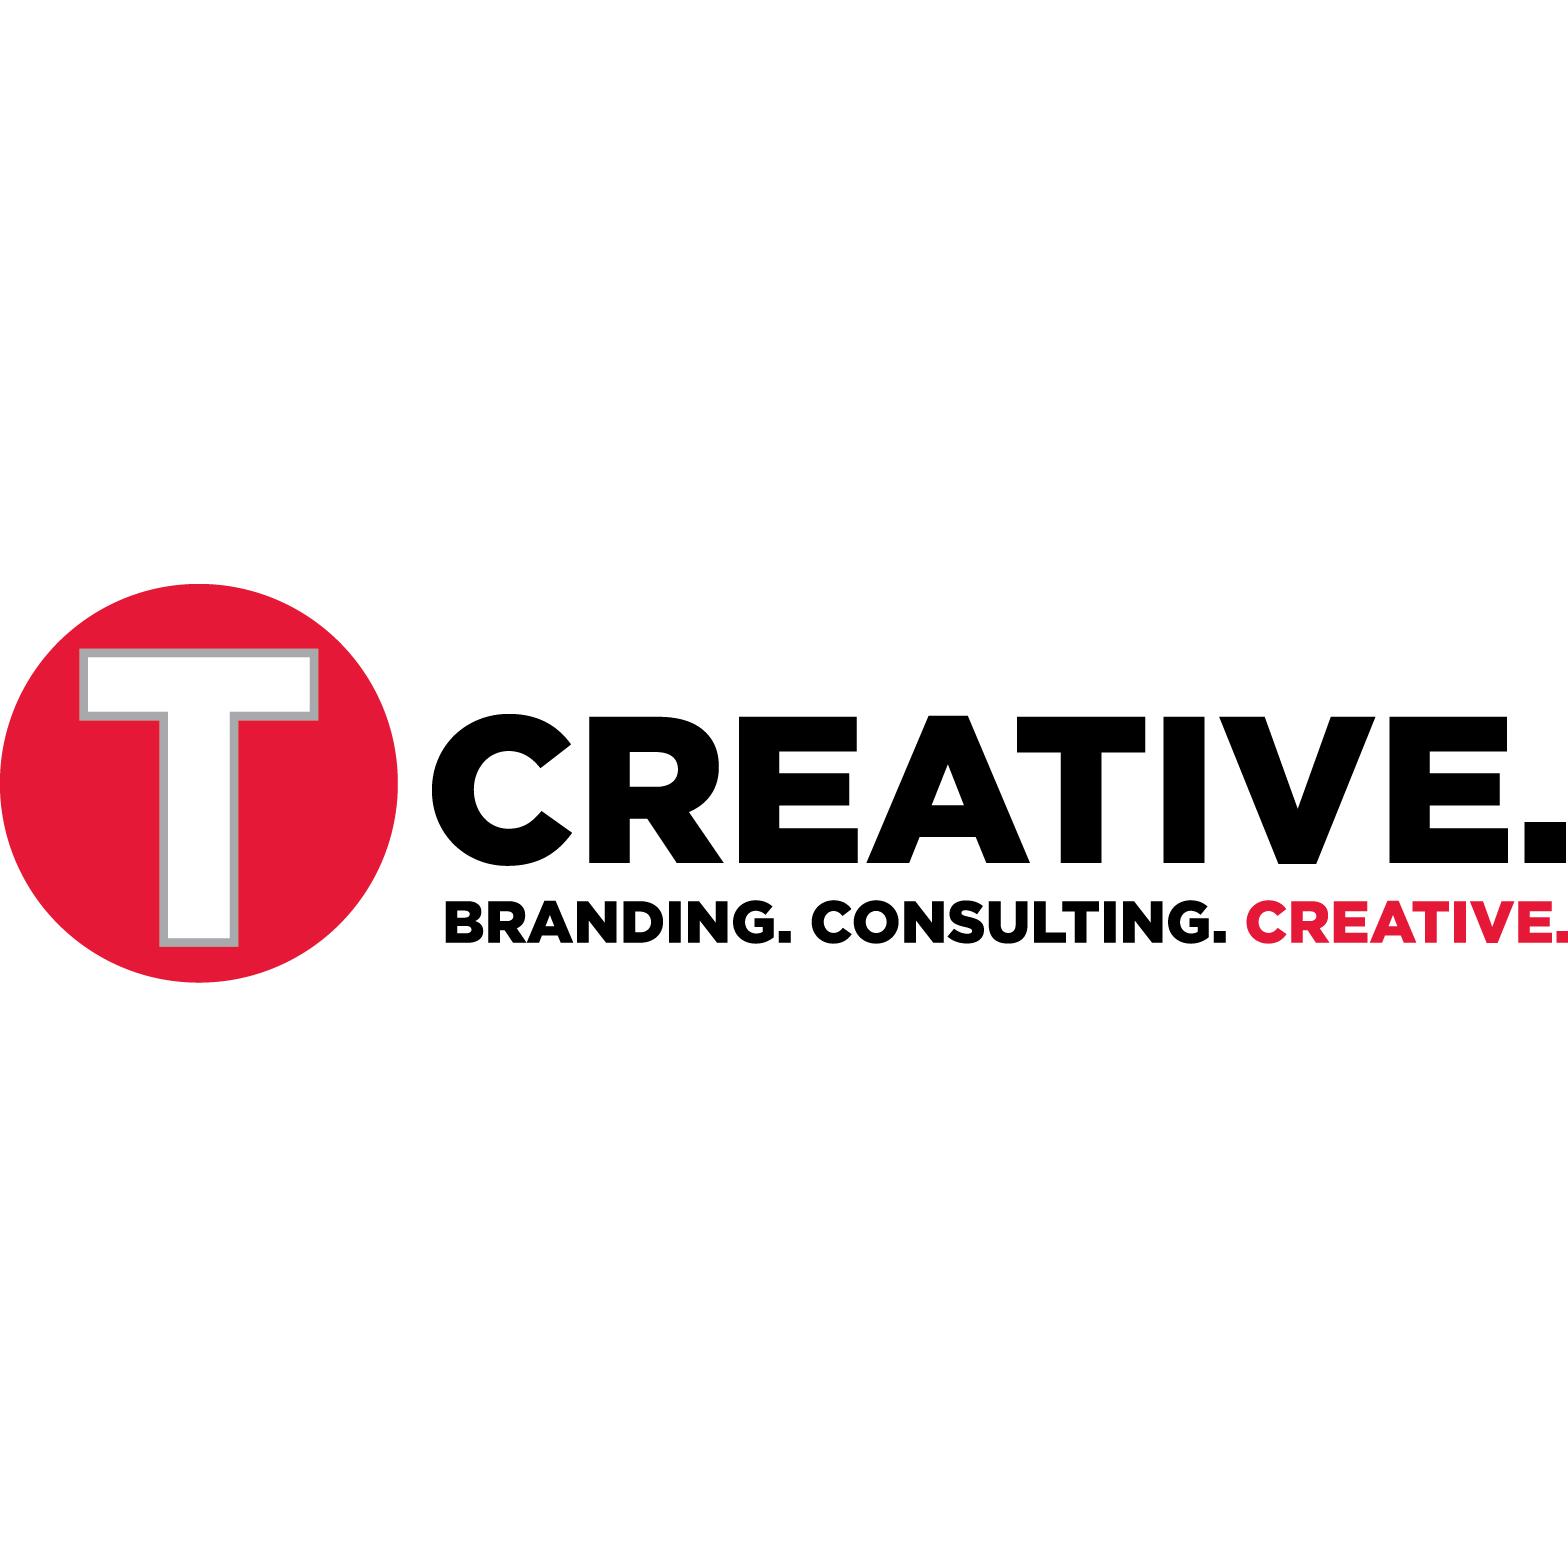 TCreative - Orlando, FL